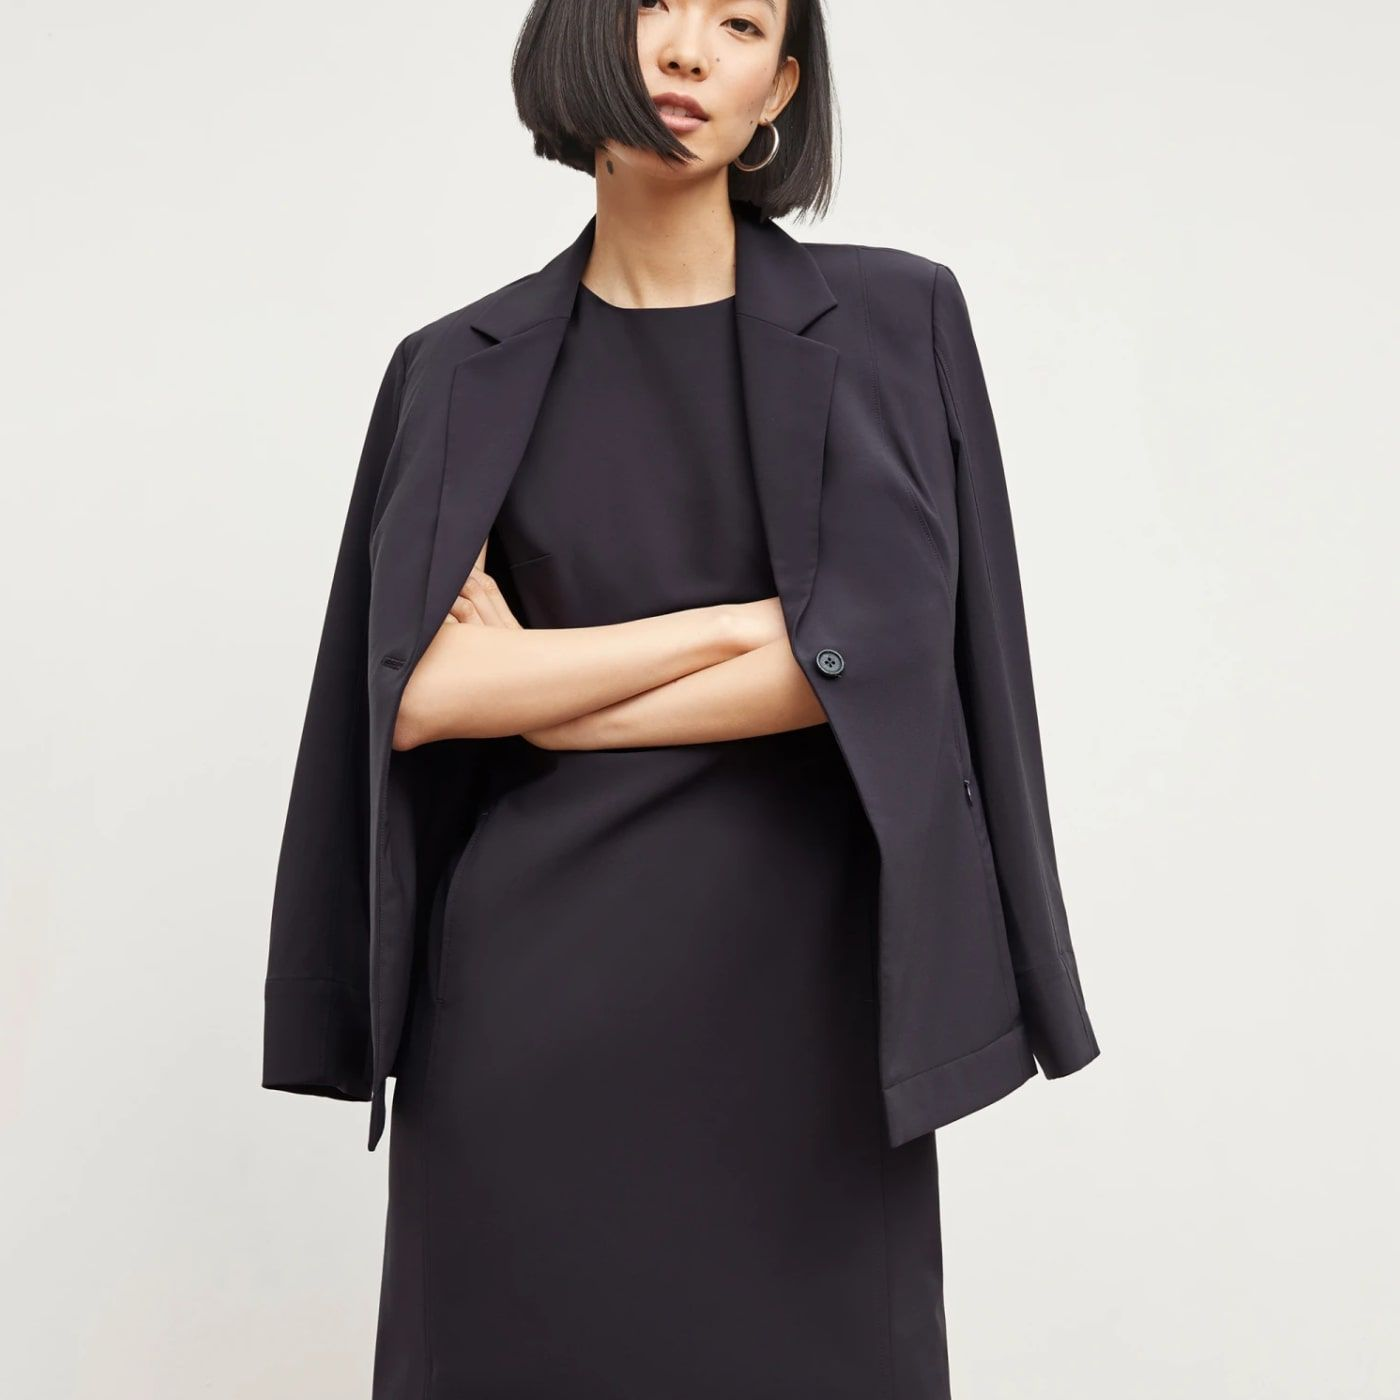 mm-lafleur-black-maaza-dress-for-work